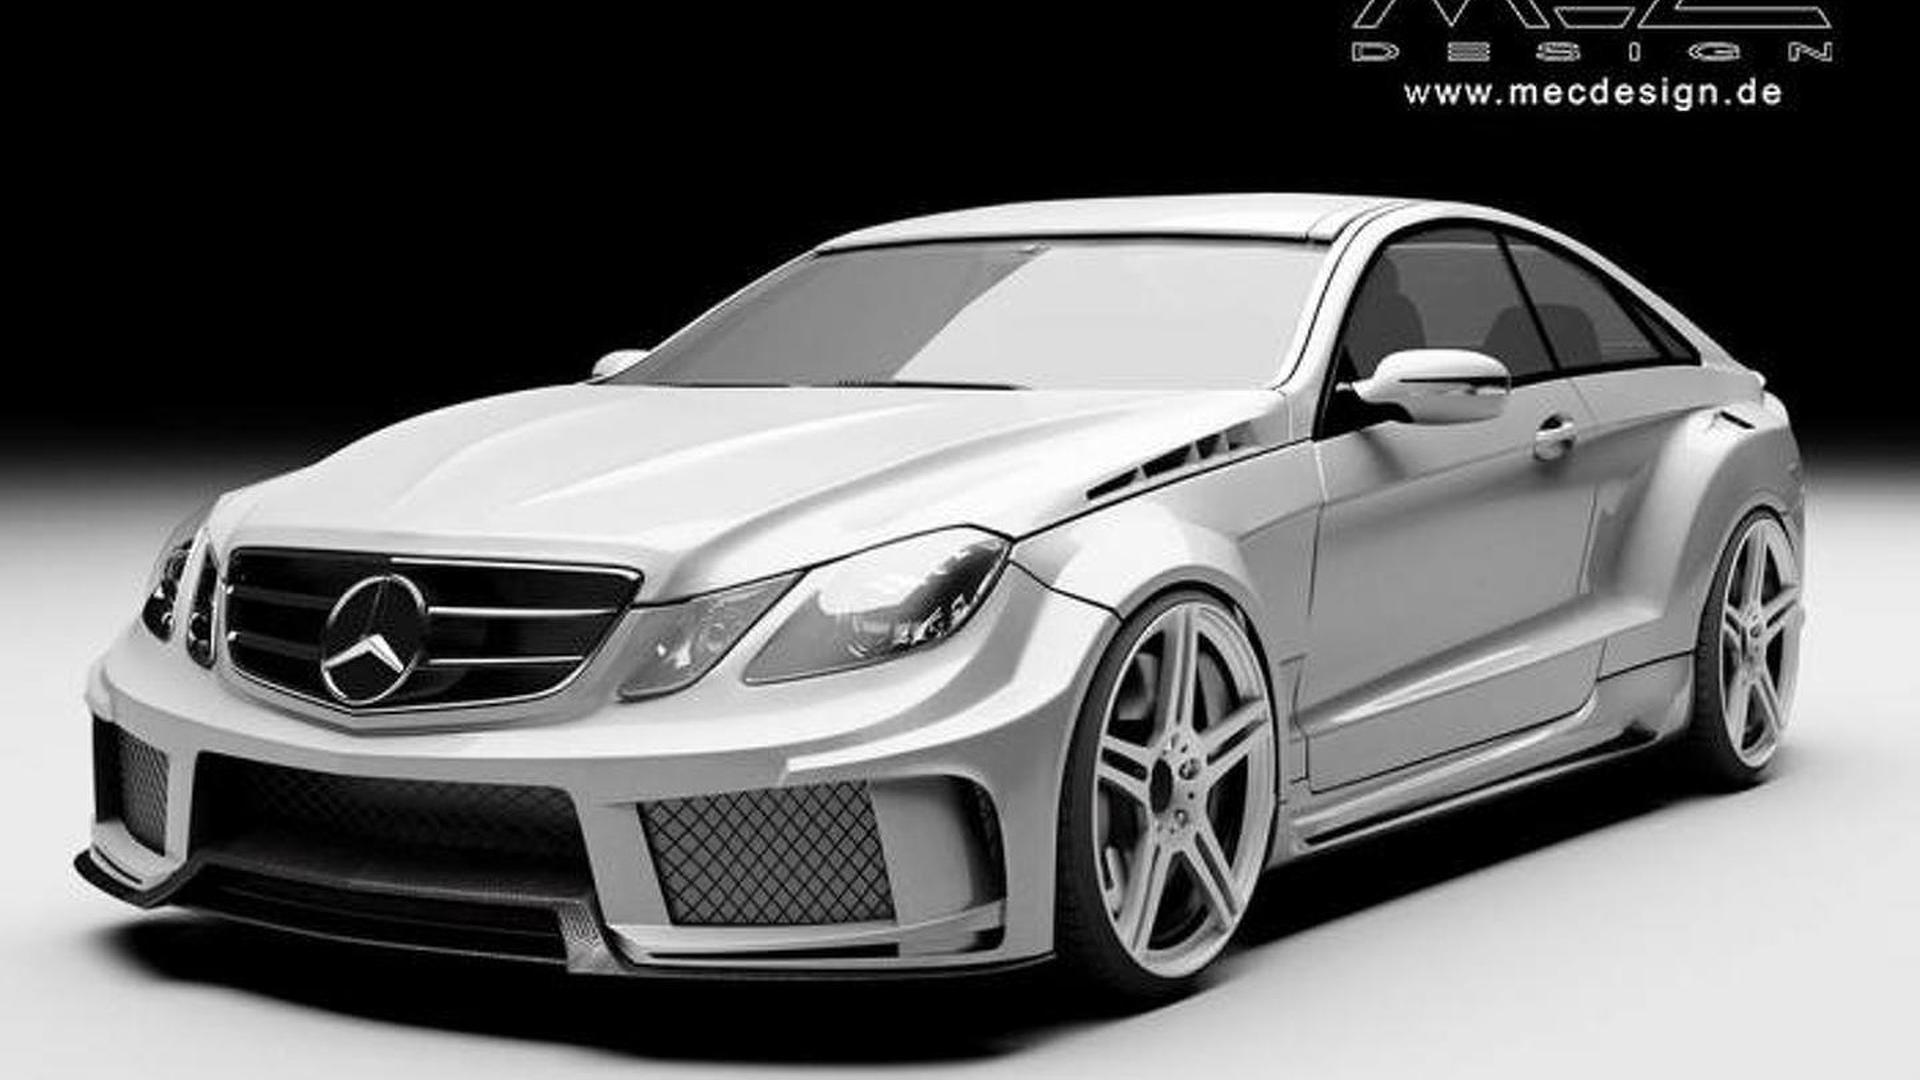 Mec design previews mercedes benz e class w207 widebody kit for Mercedes benz w207